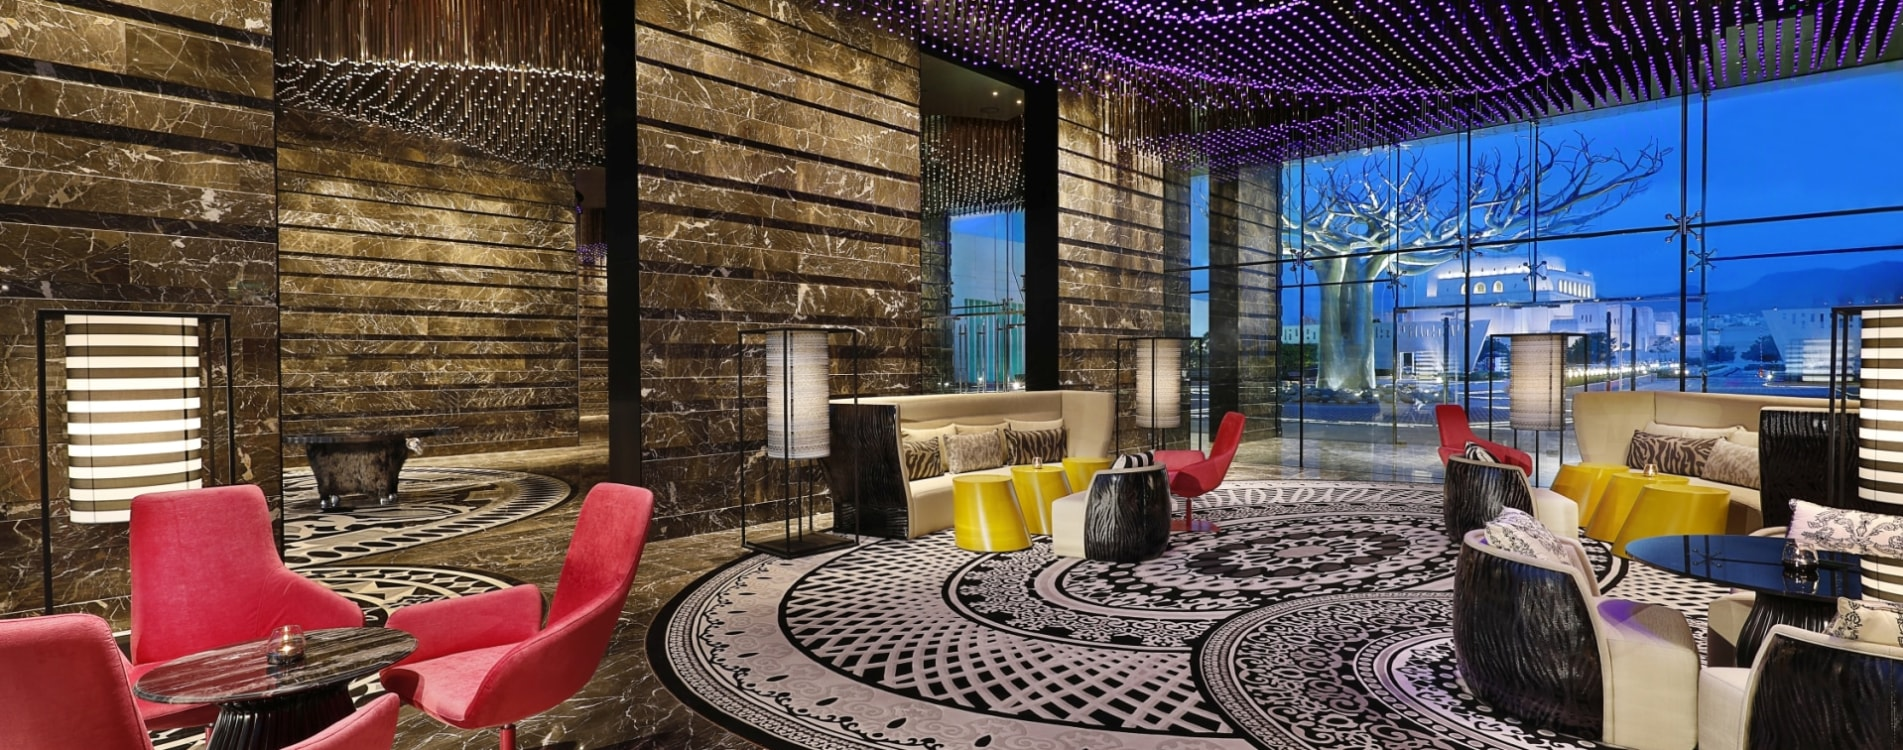 W-Muscat-Oman-Lounge-Interior.jpg